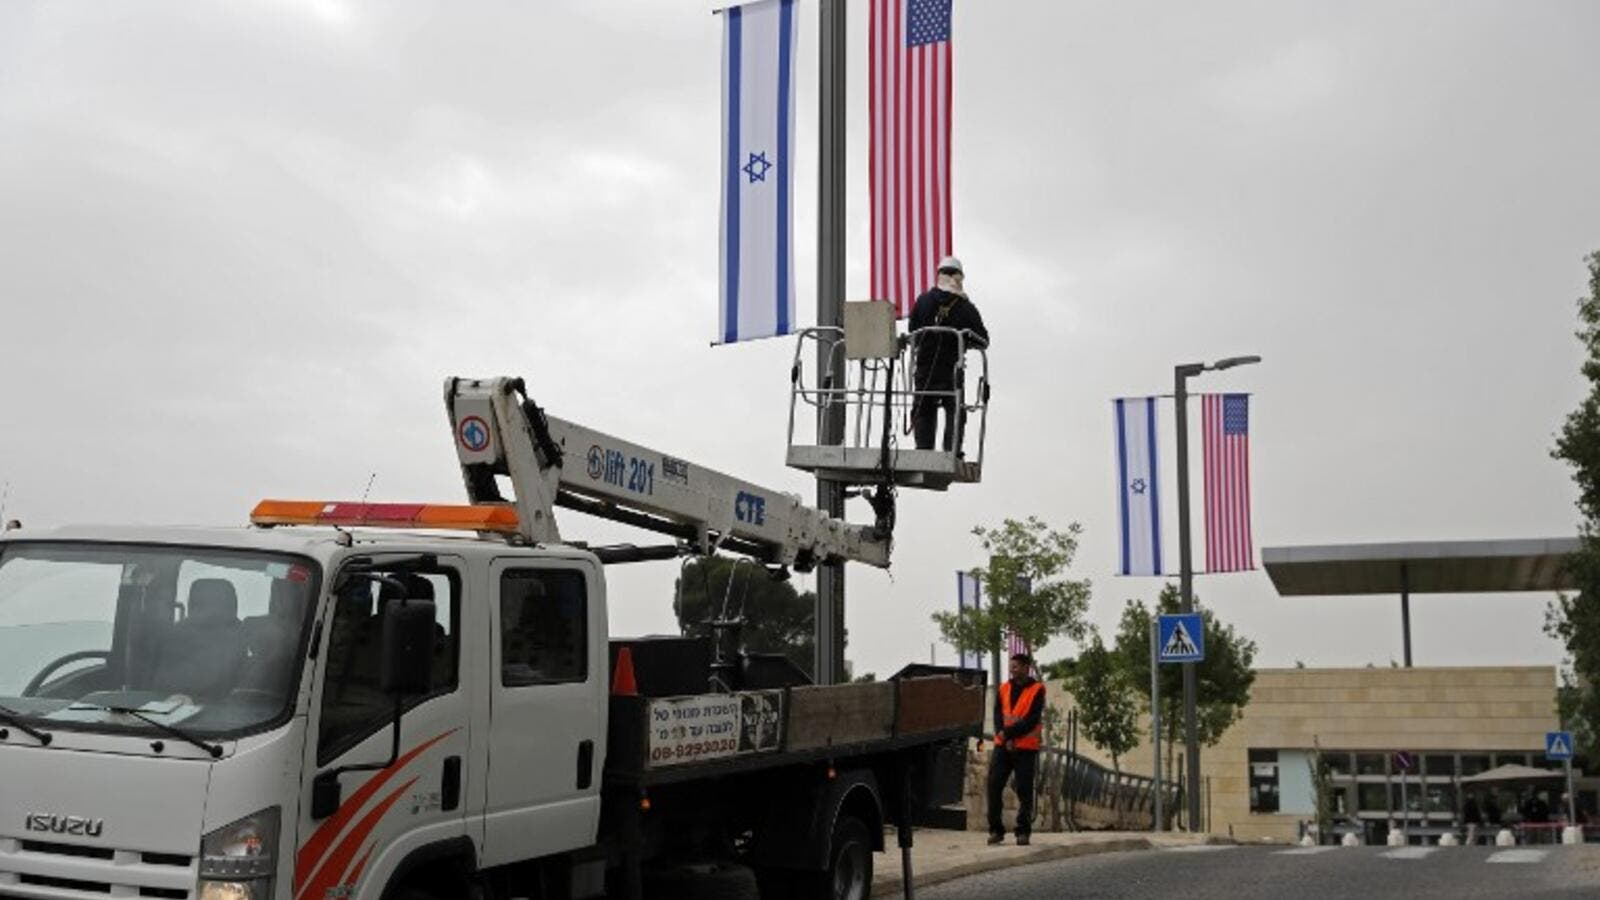 U S  Embassy' Signs Hoisted on Jerusalem Streets